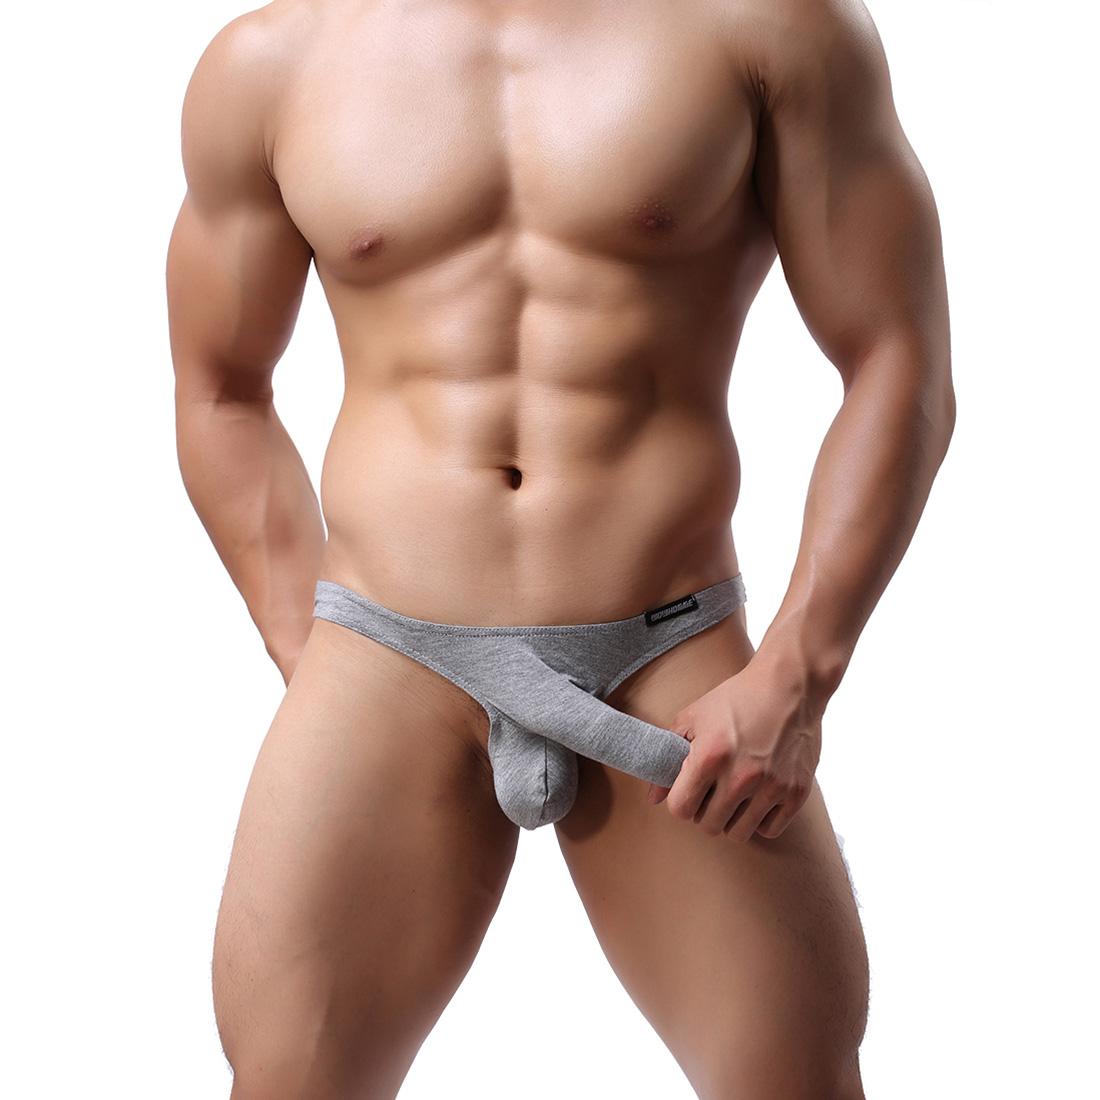 Men's Sexy Lingerie Underwear Modal Triangle Pants Shorts ...